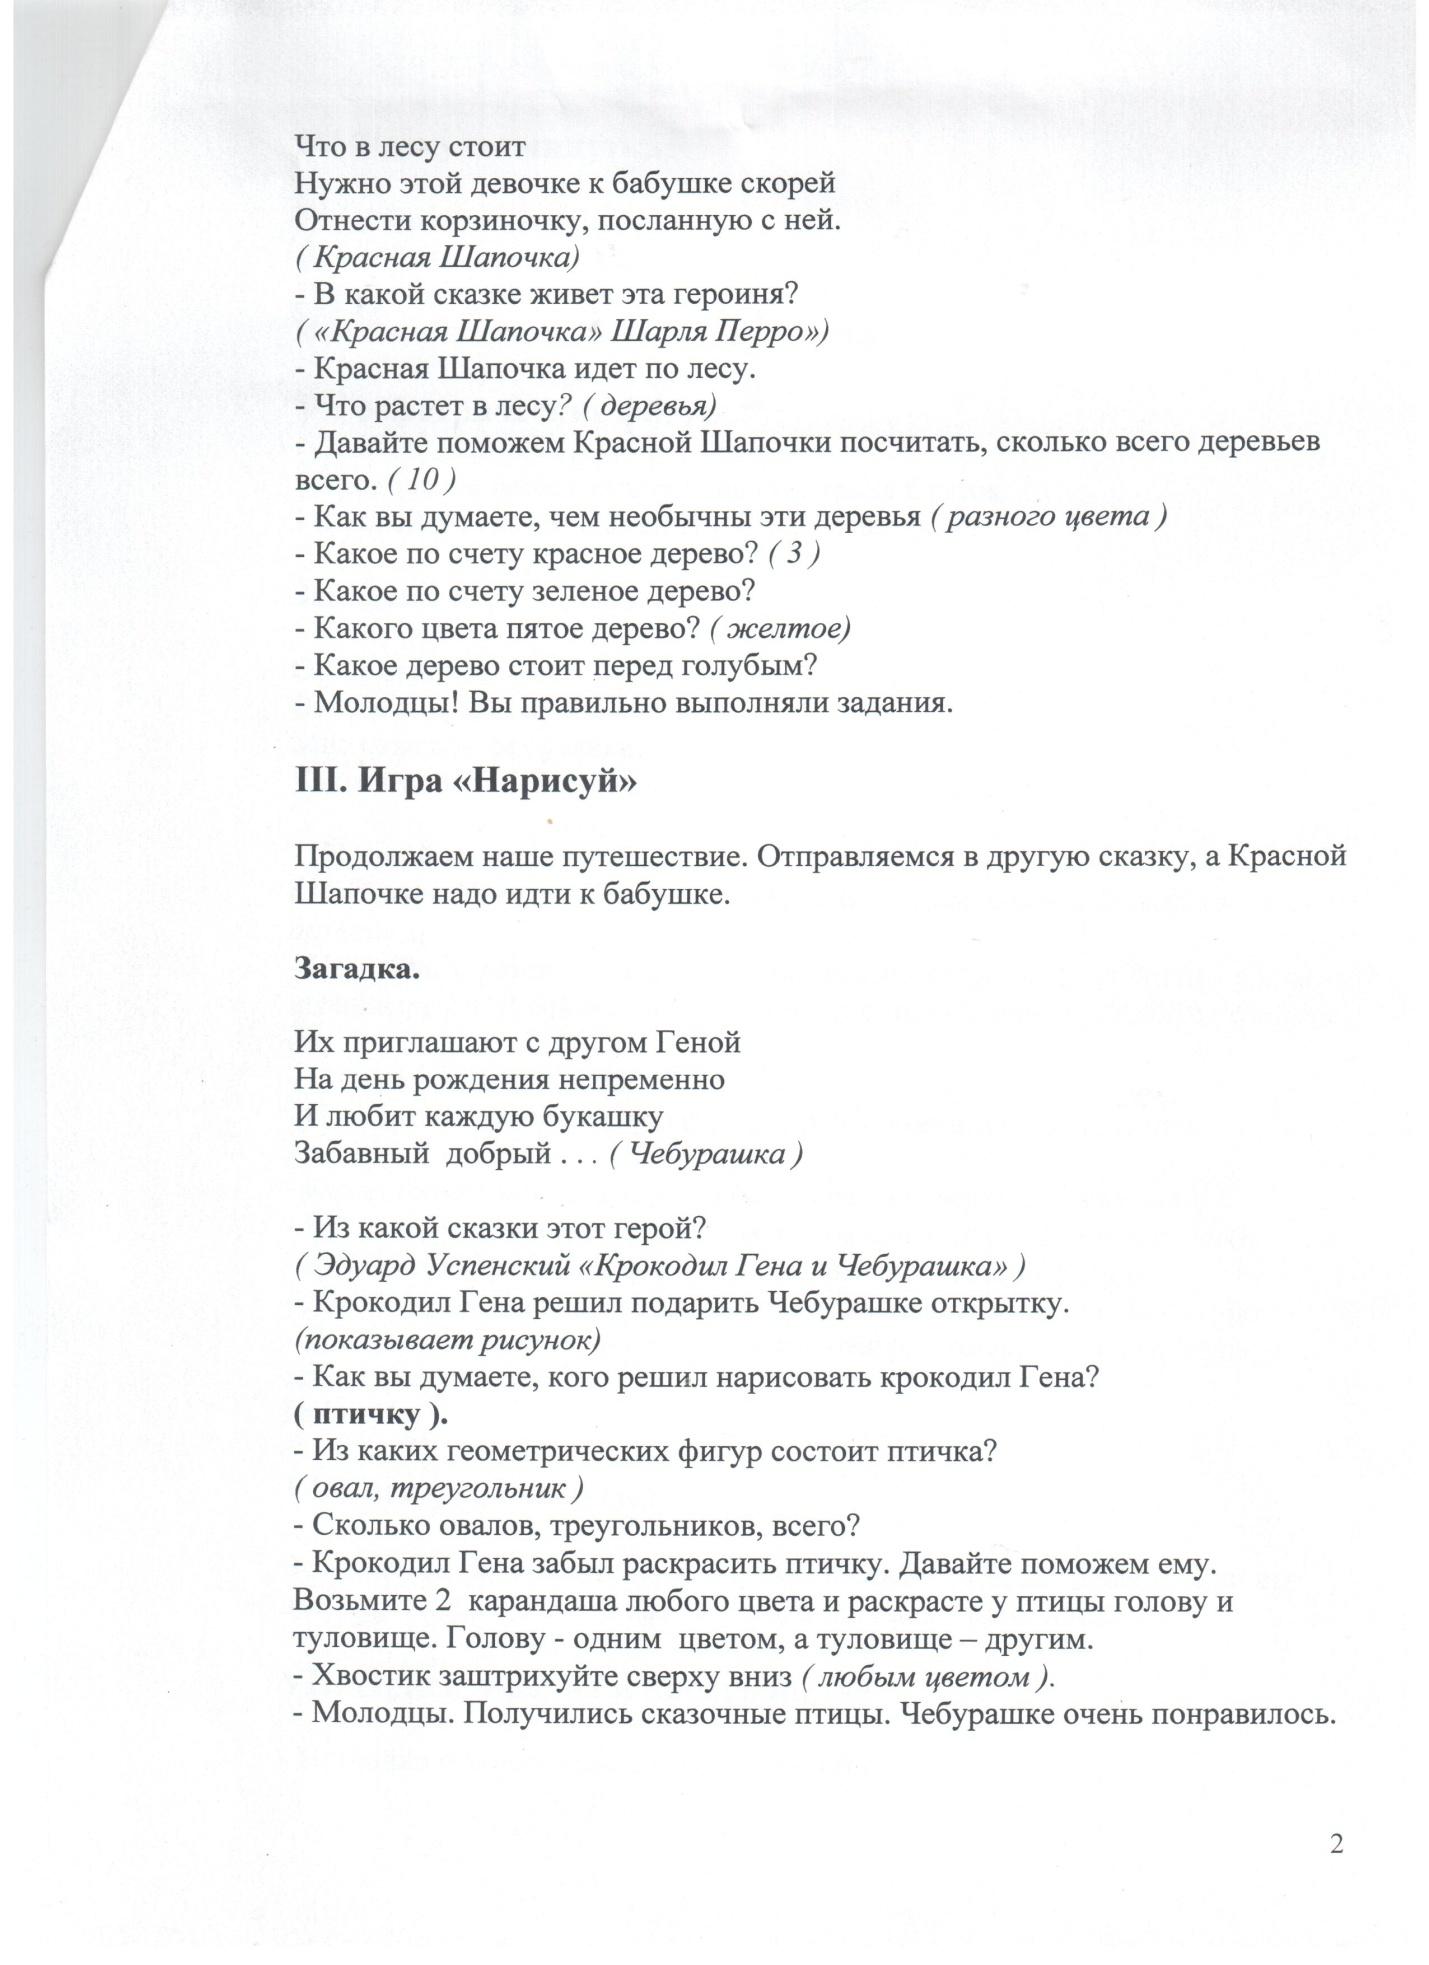 C:\Users\uzer\Desktop\2014-07-17 АЕМ\АЕМ 002.jpg